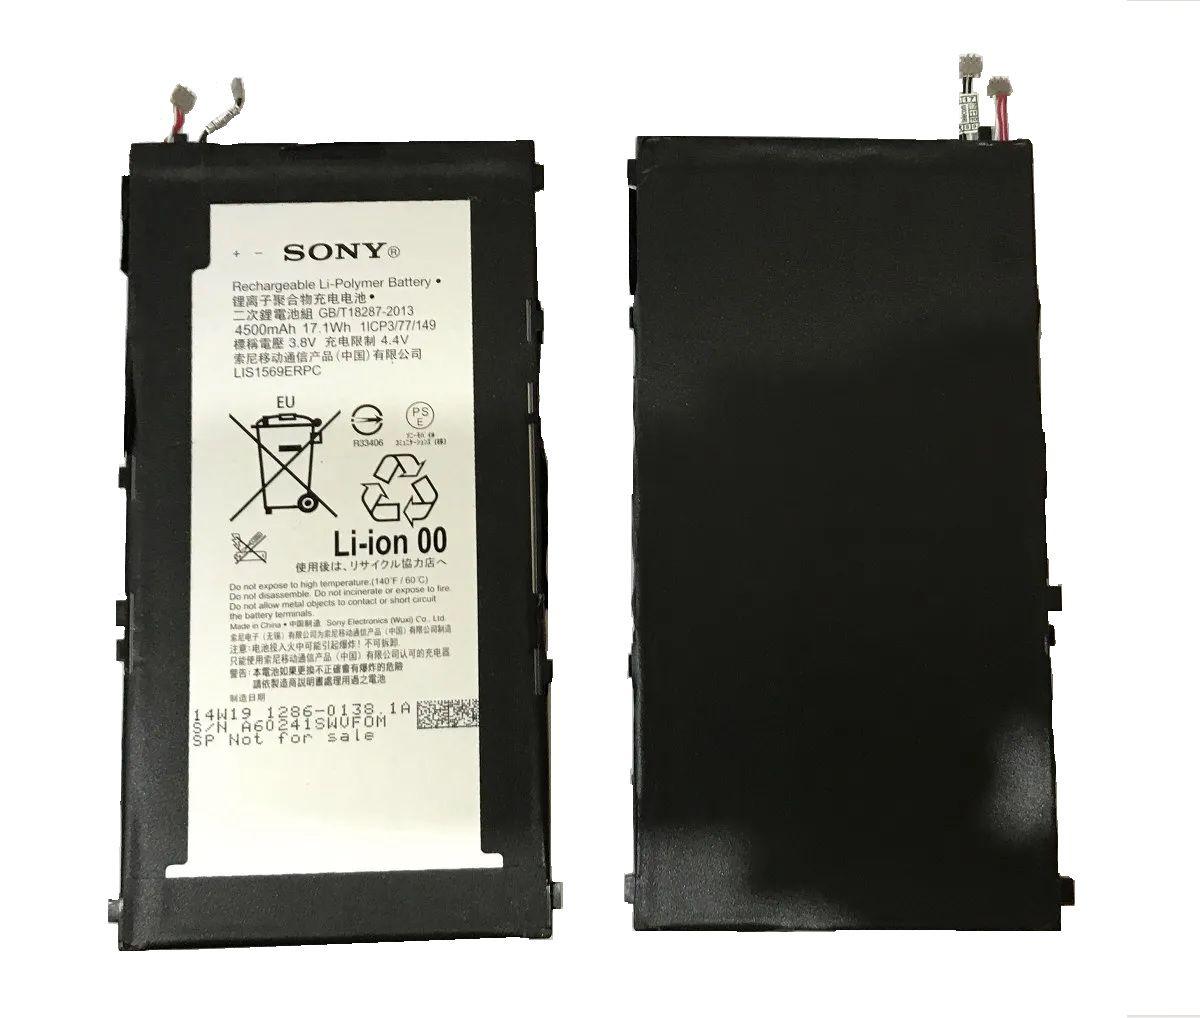 Bateria Tablet Sony Xperia Z3 Lis1569erpc 4500mah Sgp611